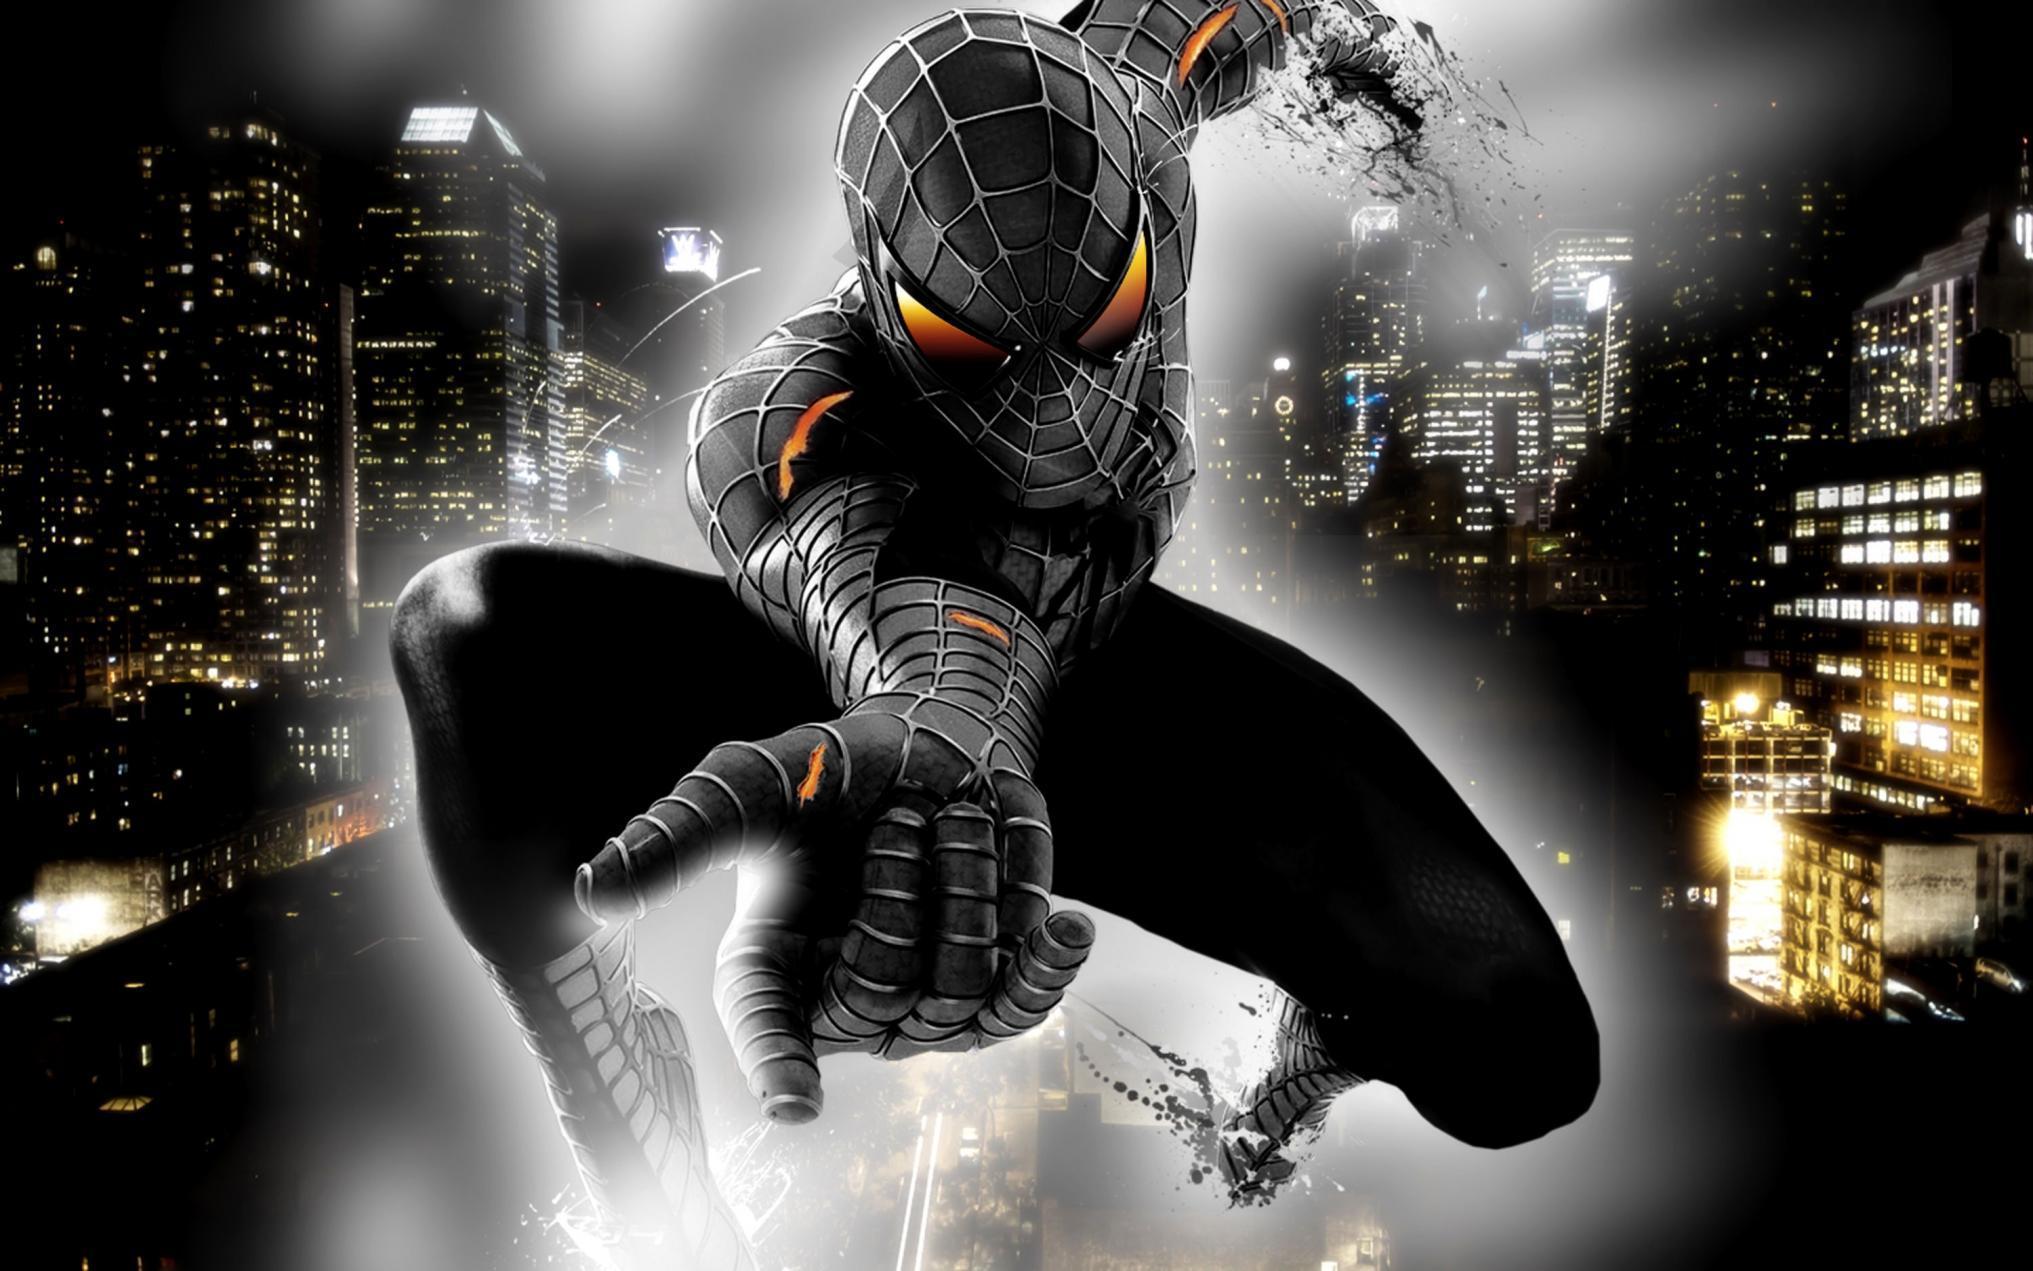 Black Spider Man Wallpapers - Wallpaper Cave